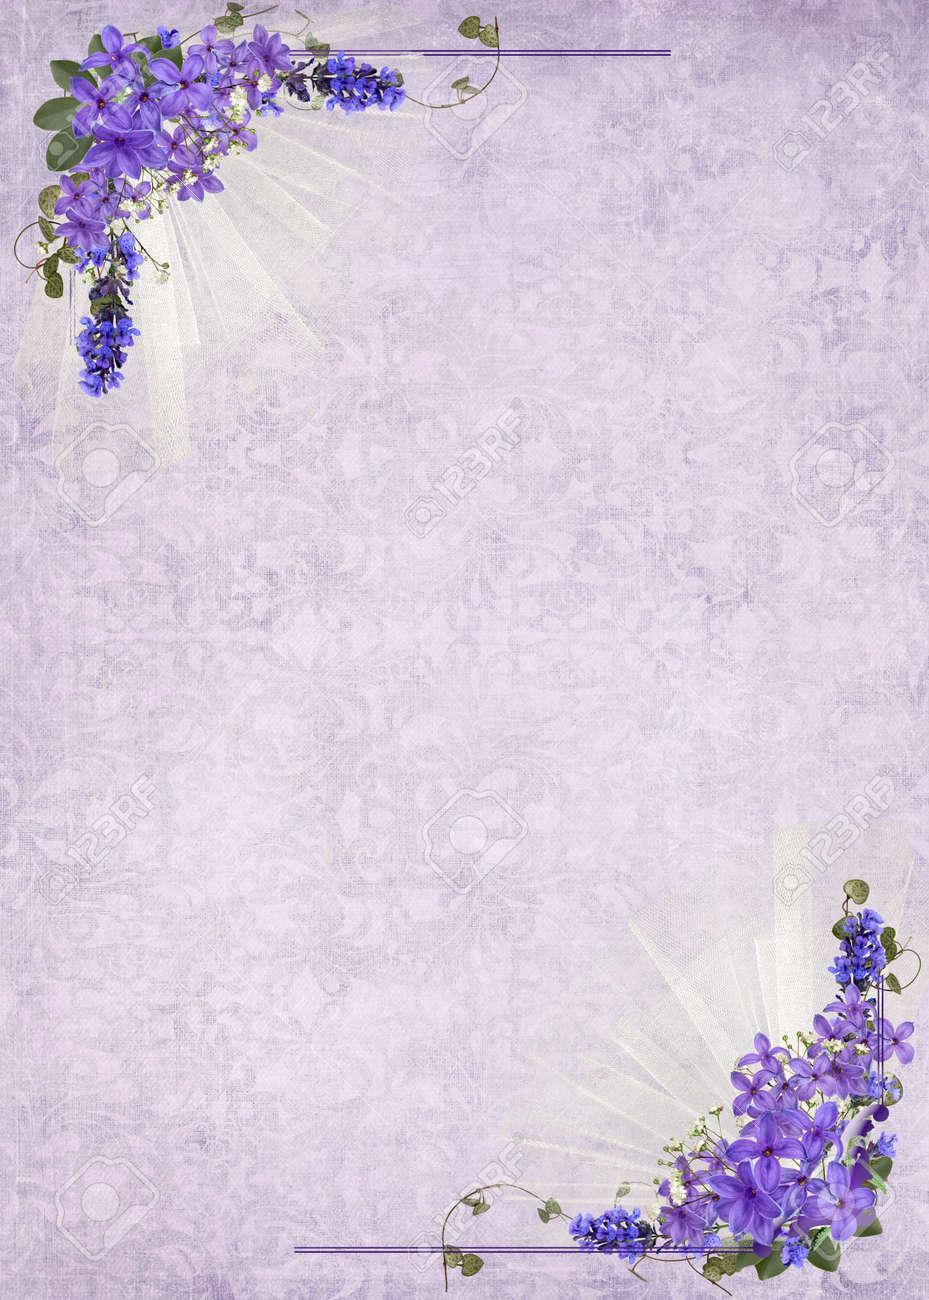 lilac corner frame on soft damask background Stock Photo - 15945684